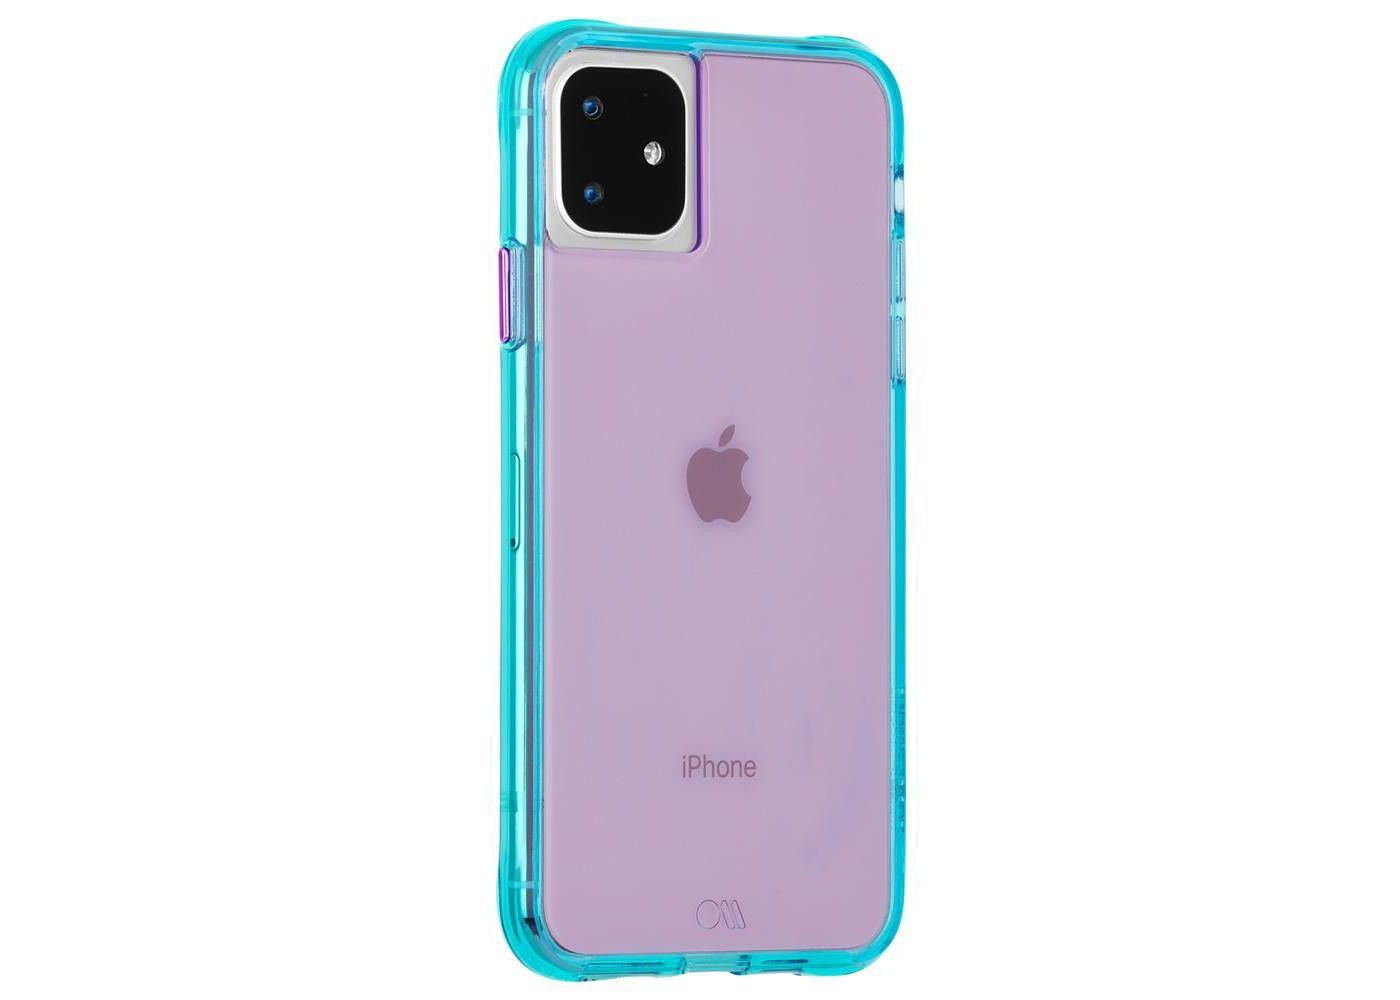 Casemate iphone 11 tough neon purple case affiliate